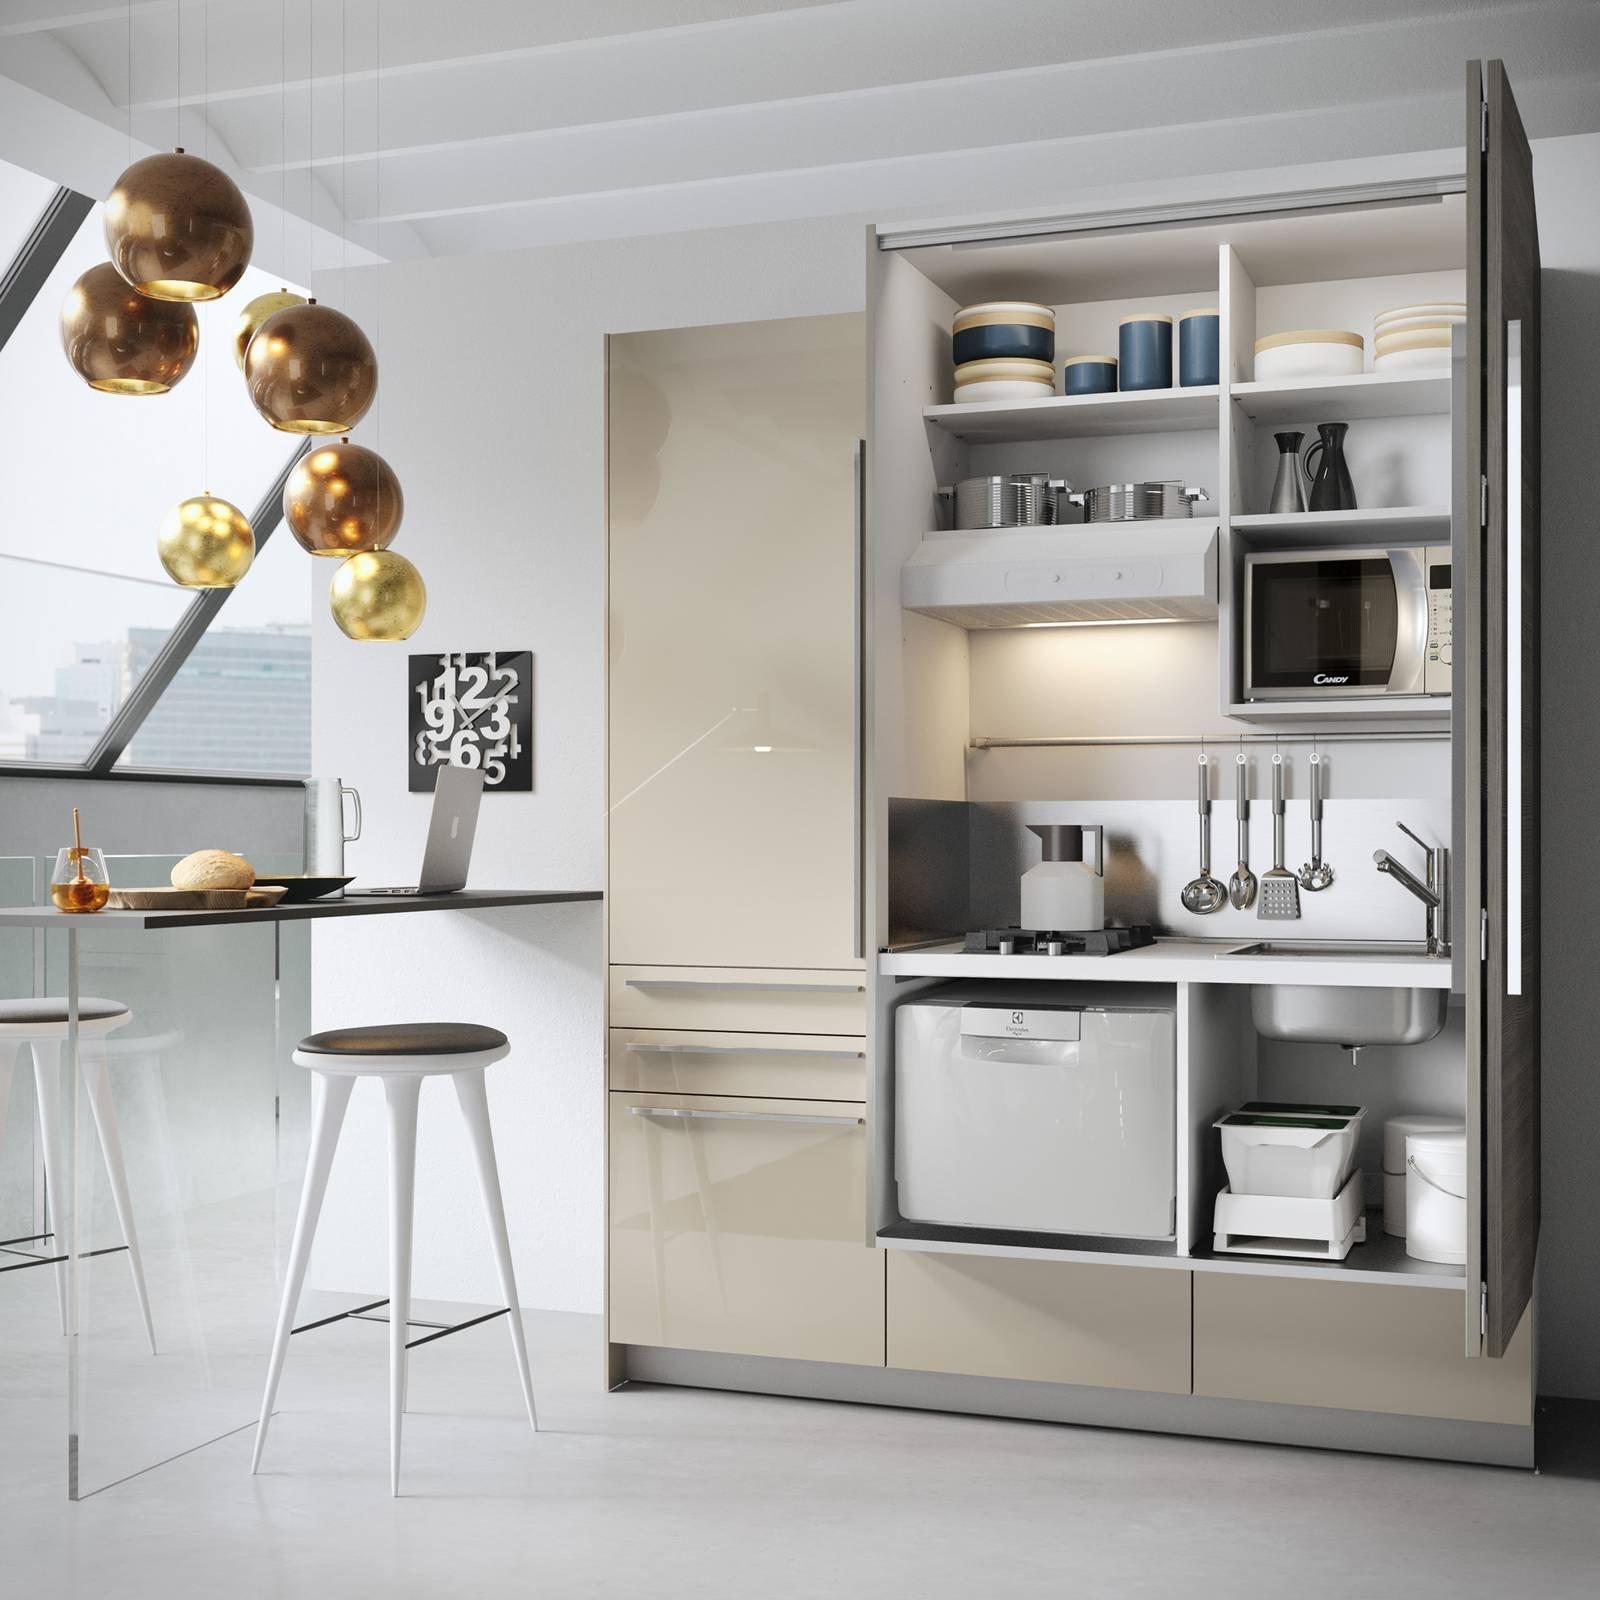 Mini cucina 5 soluzioni per la cucina piccola cose di casa - Mini cucina per bambini ...